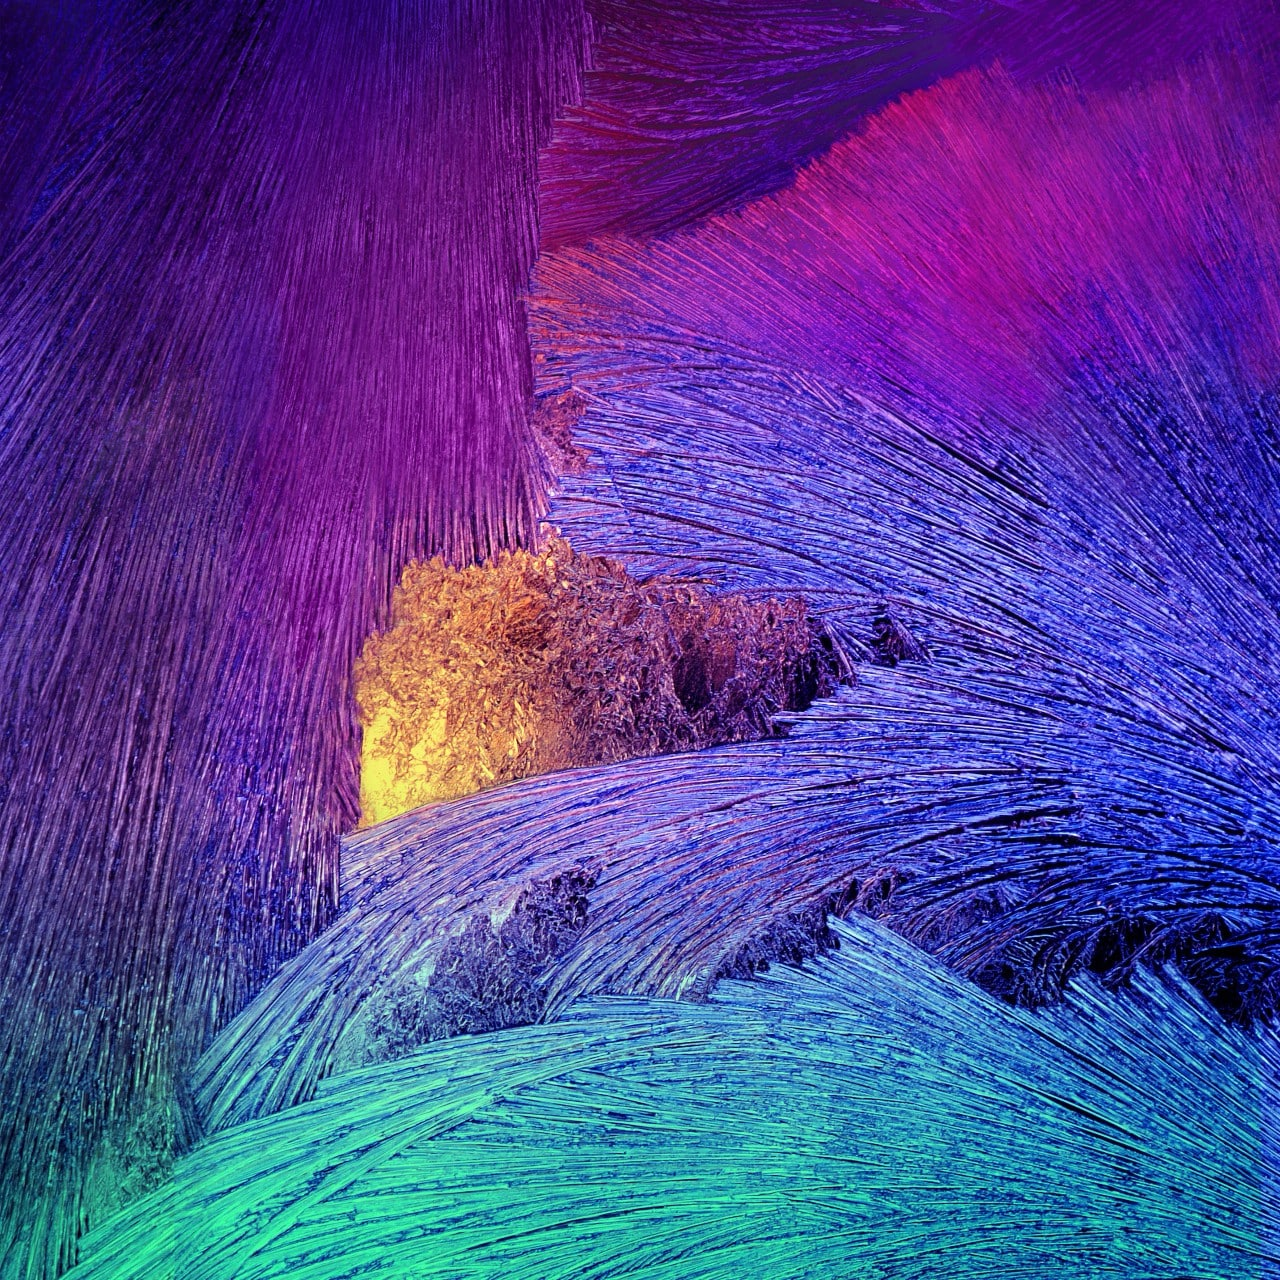 wallpaper_002